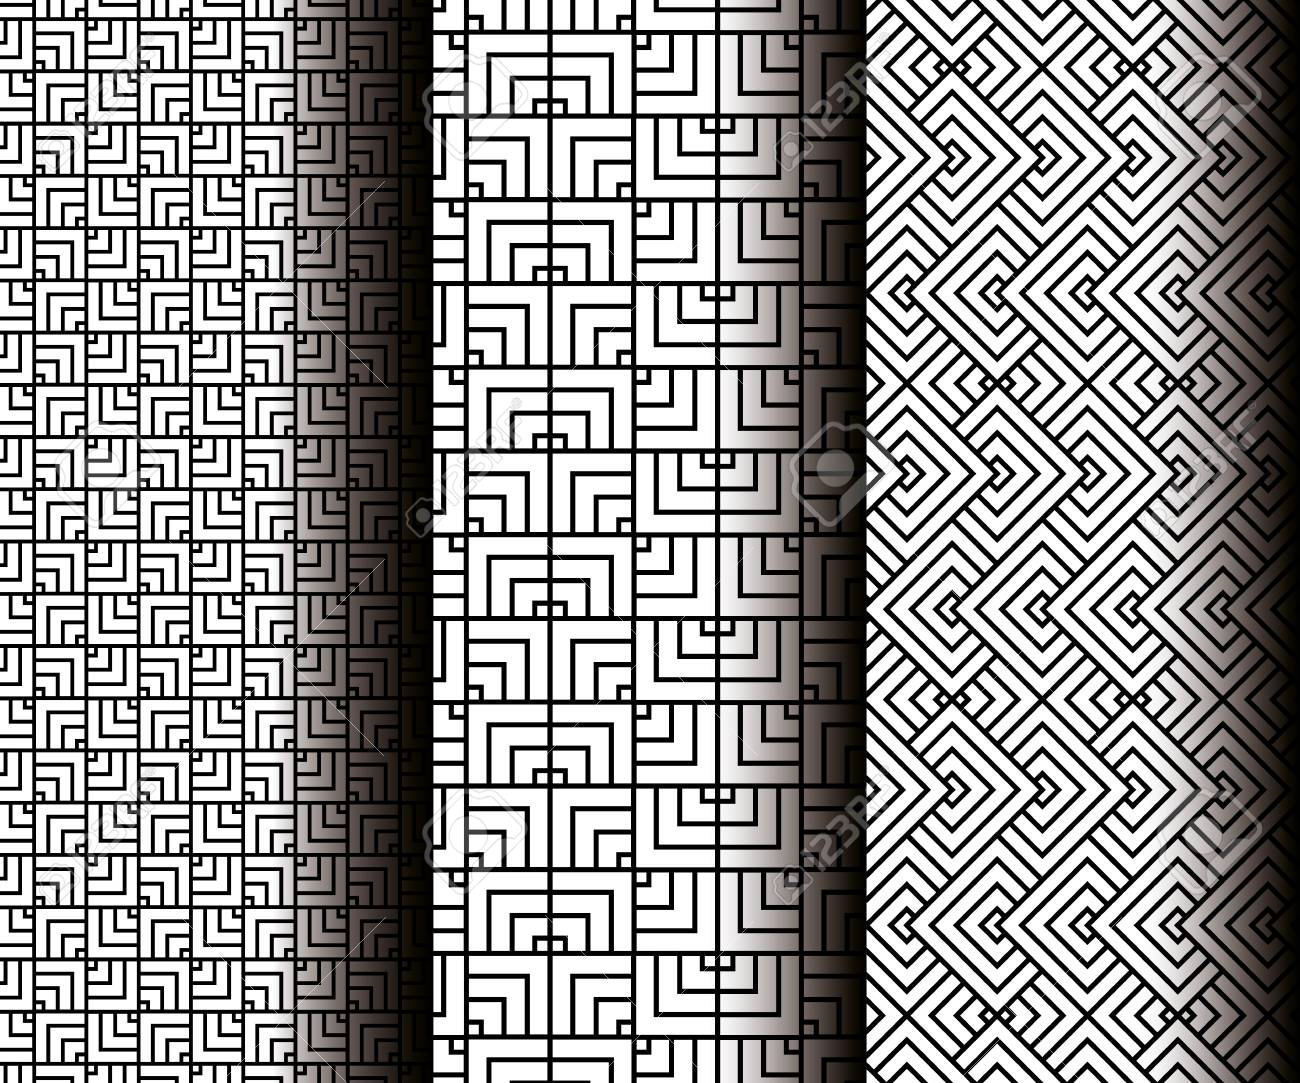 set geometrics figures in grey patterns vector illustration design - 110361088